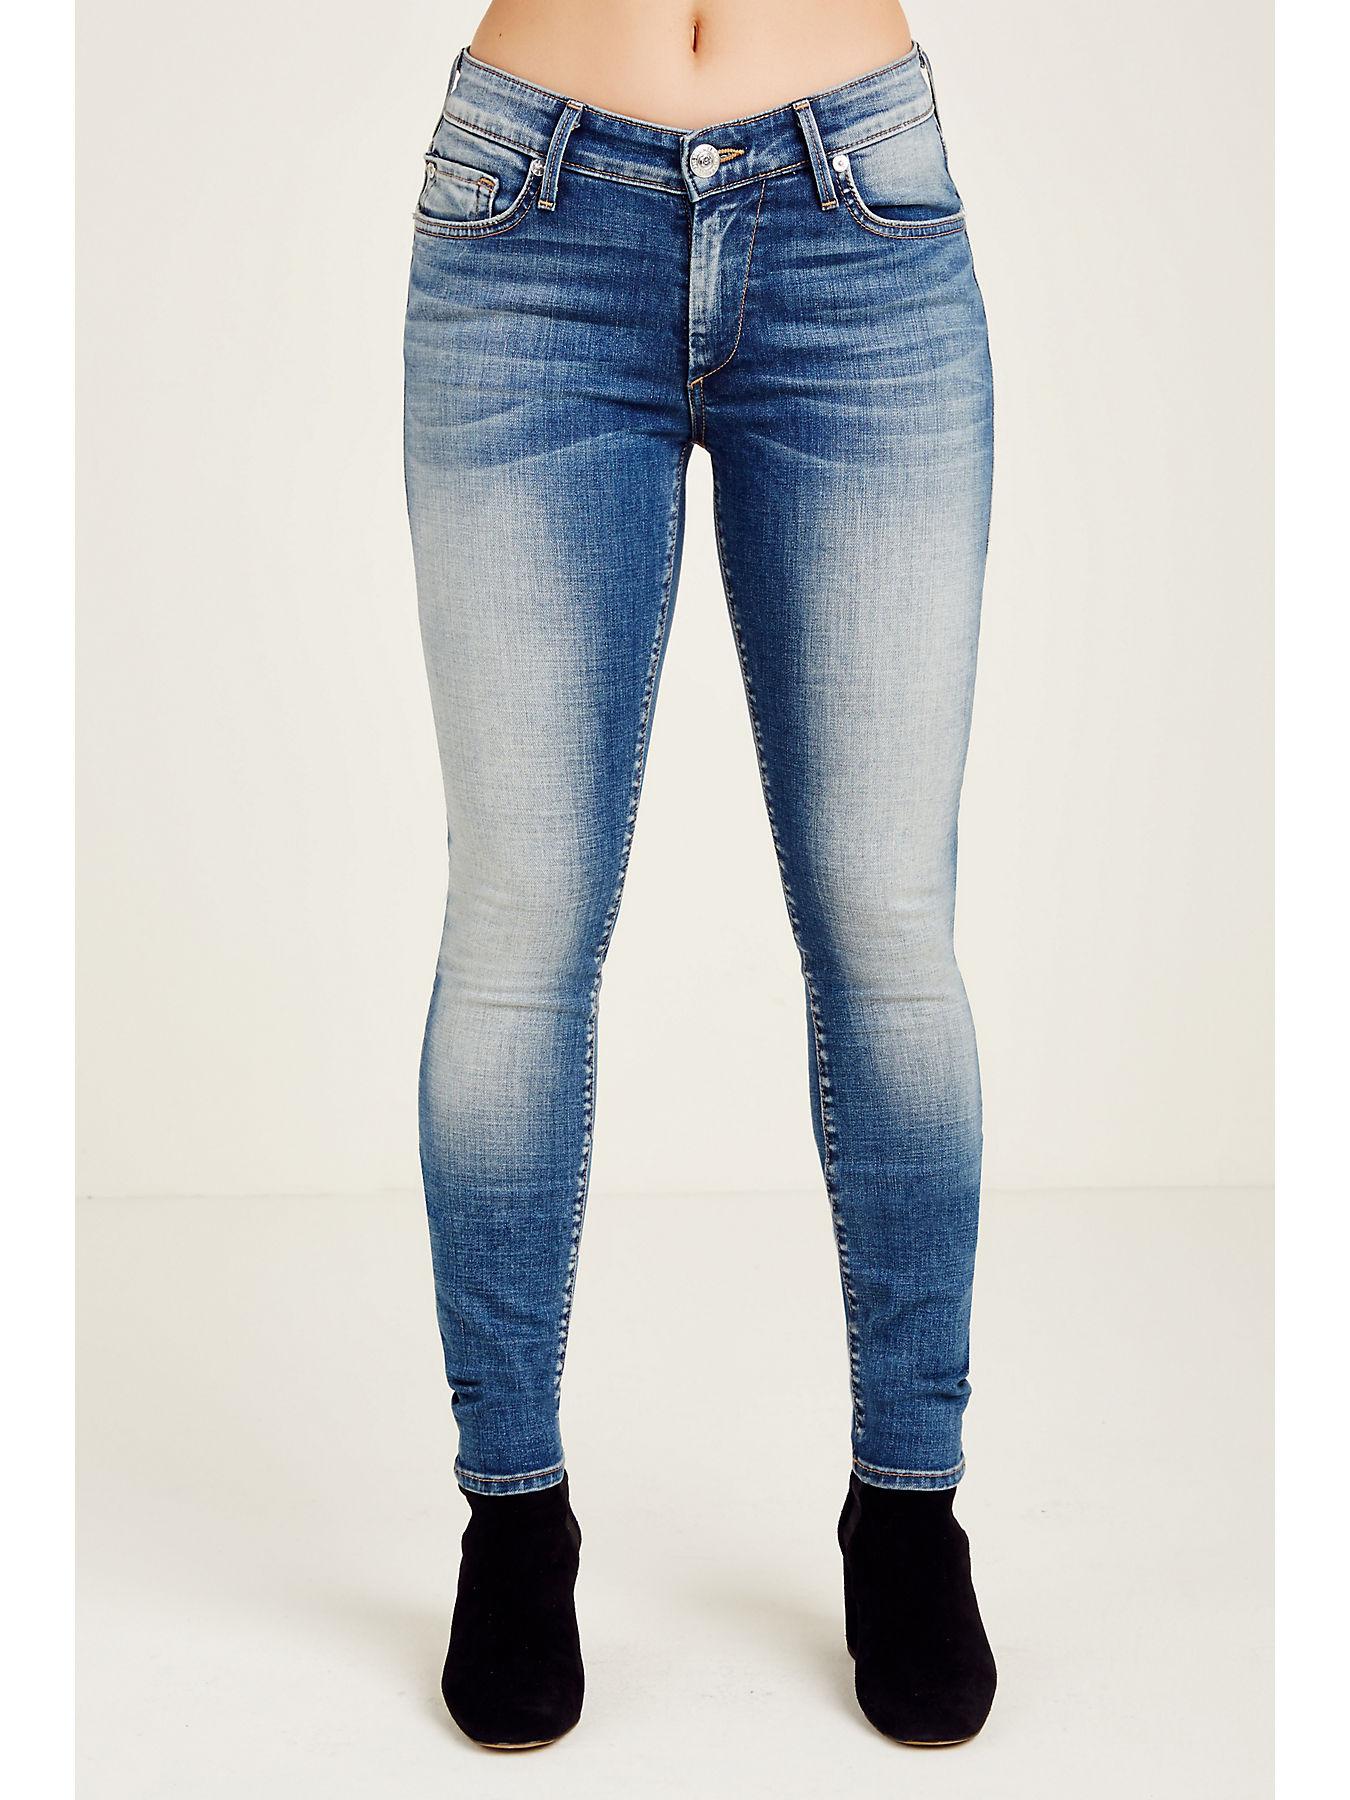 7e58294bf5 Jennie Curvy Mid Rise Skinny Women's Jeans | True Religion